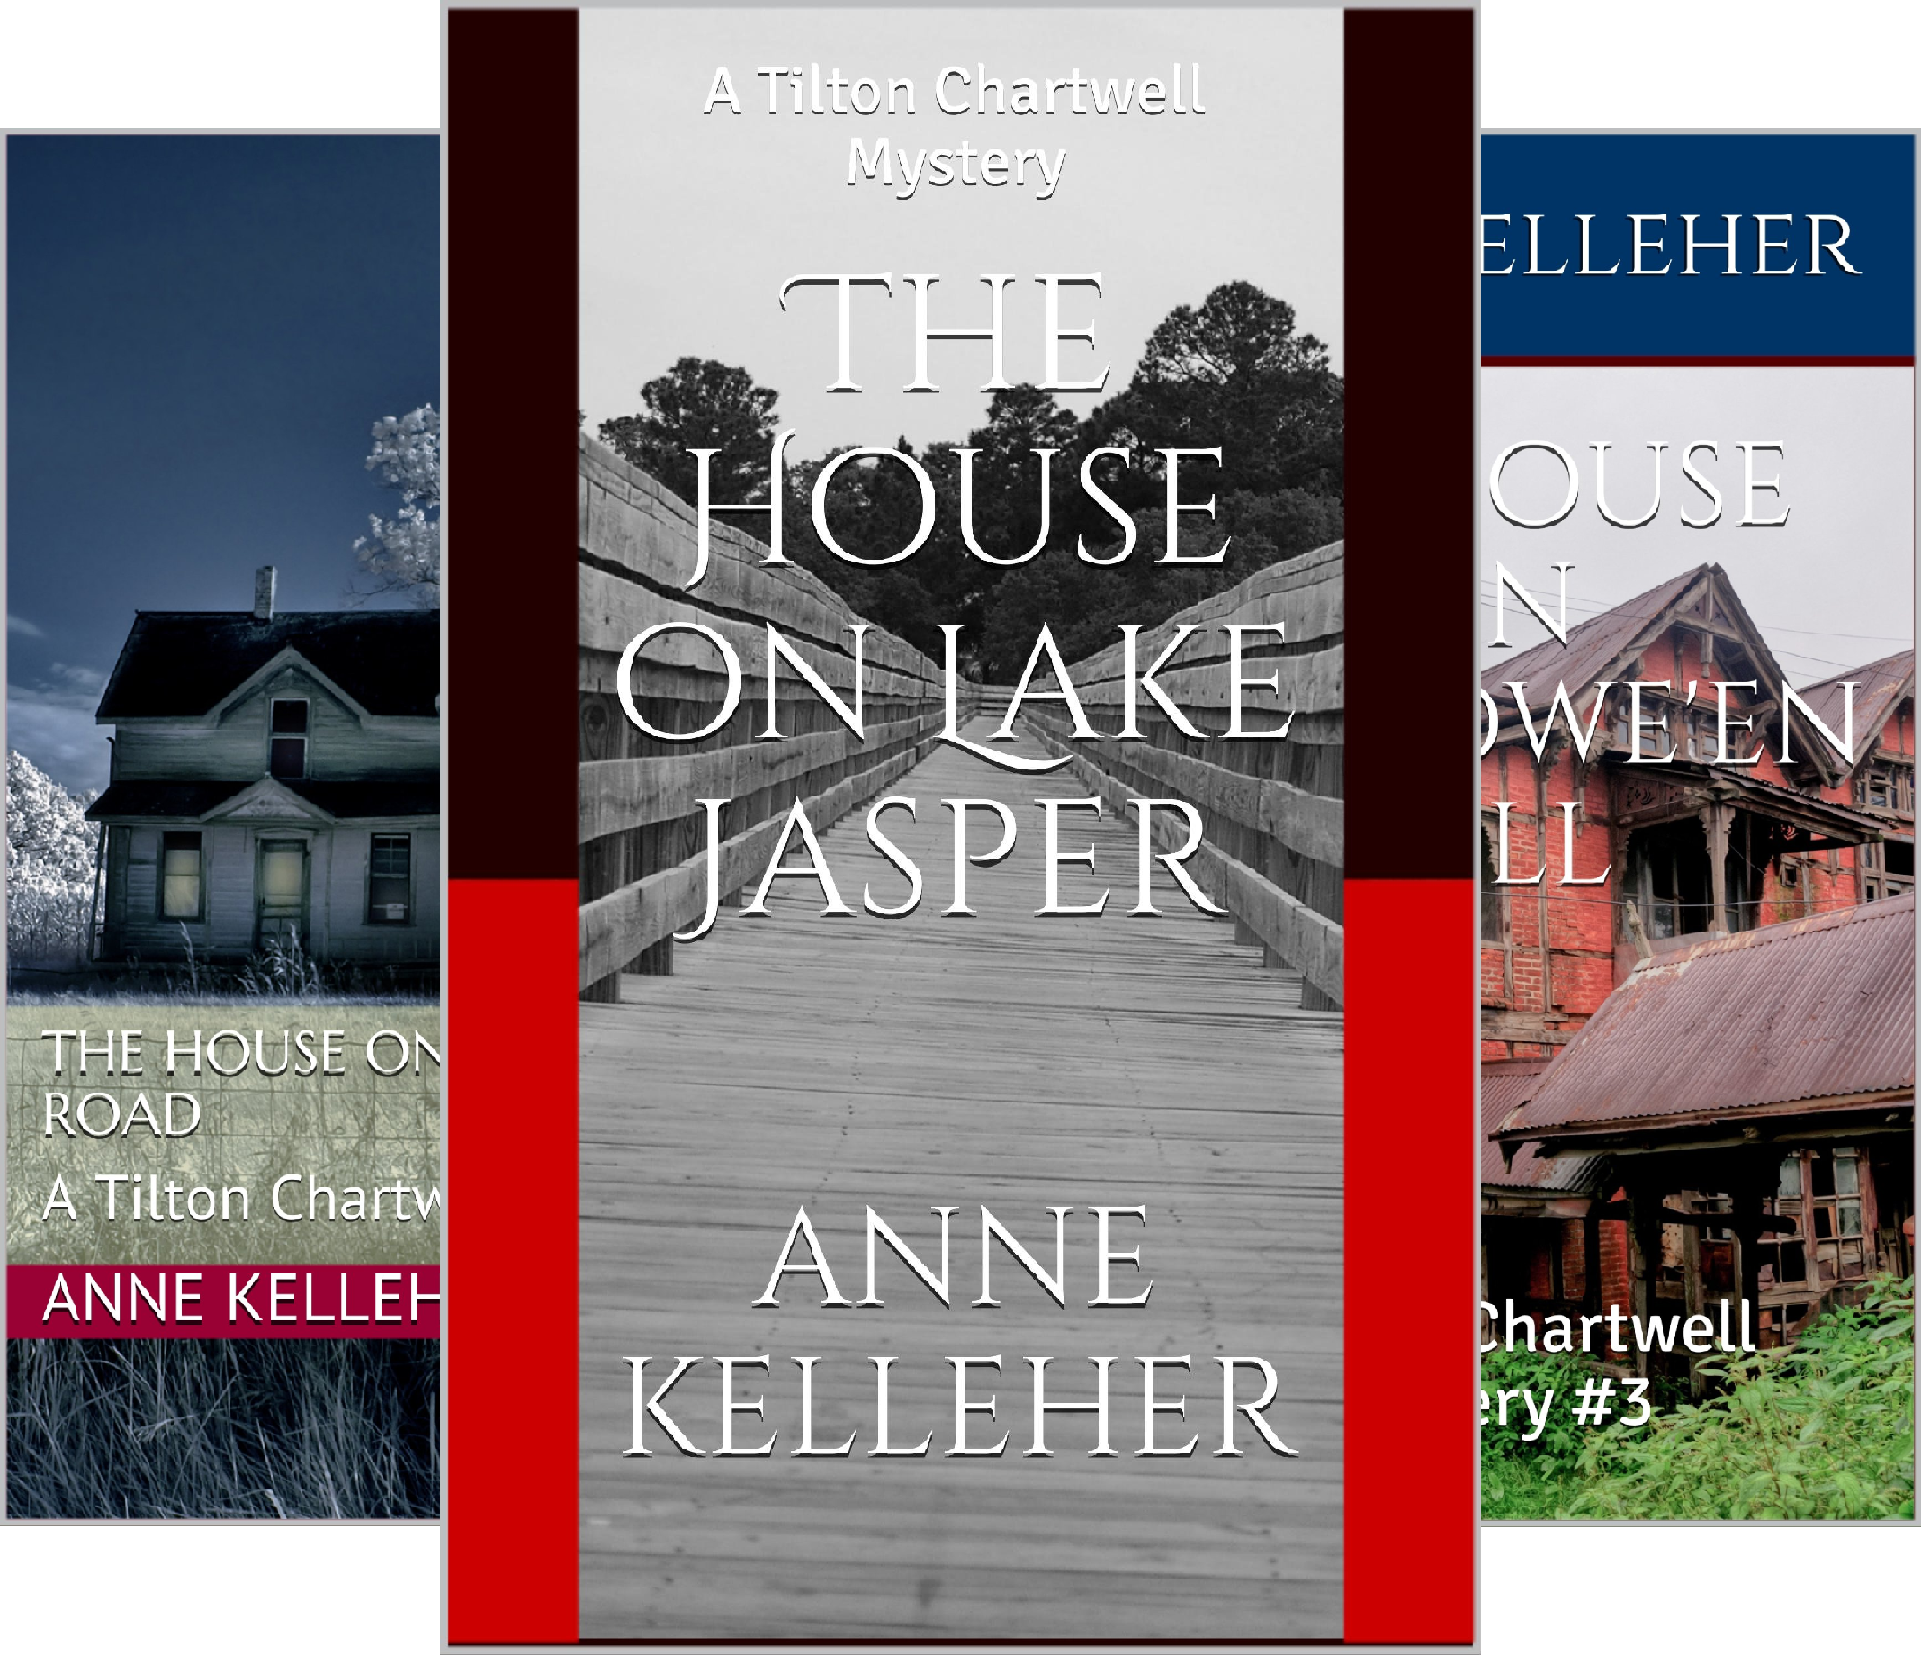 Tilton Chartwell Mysteries (3 Book Series)